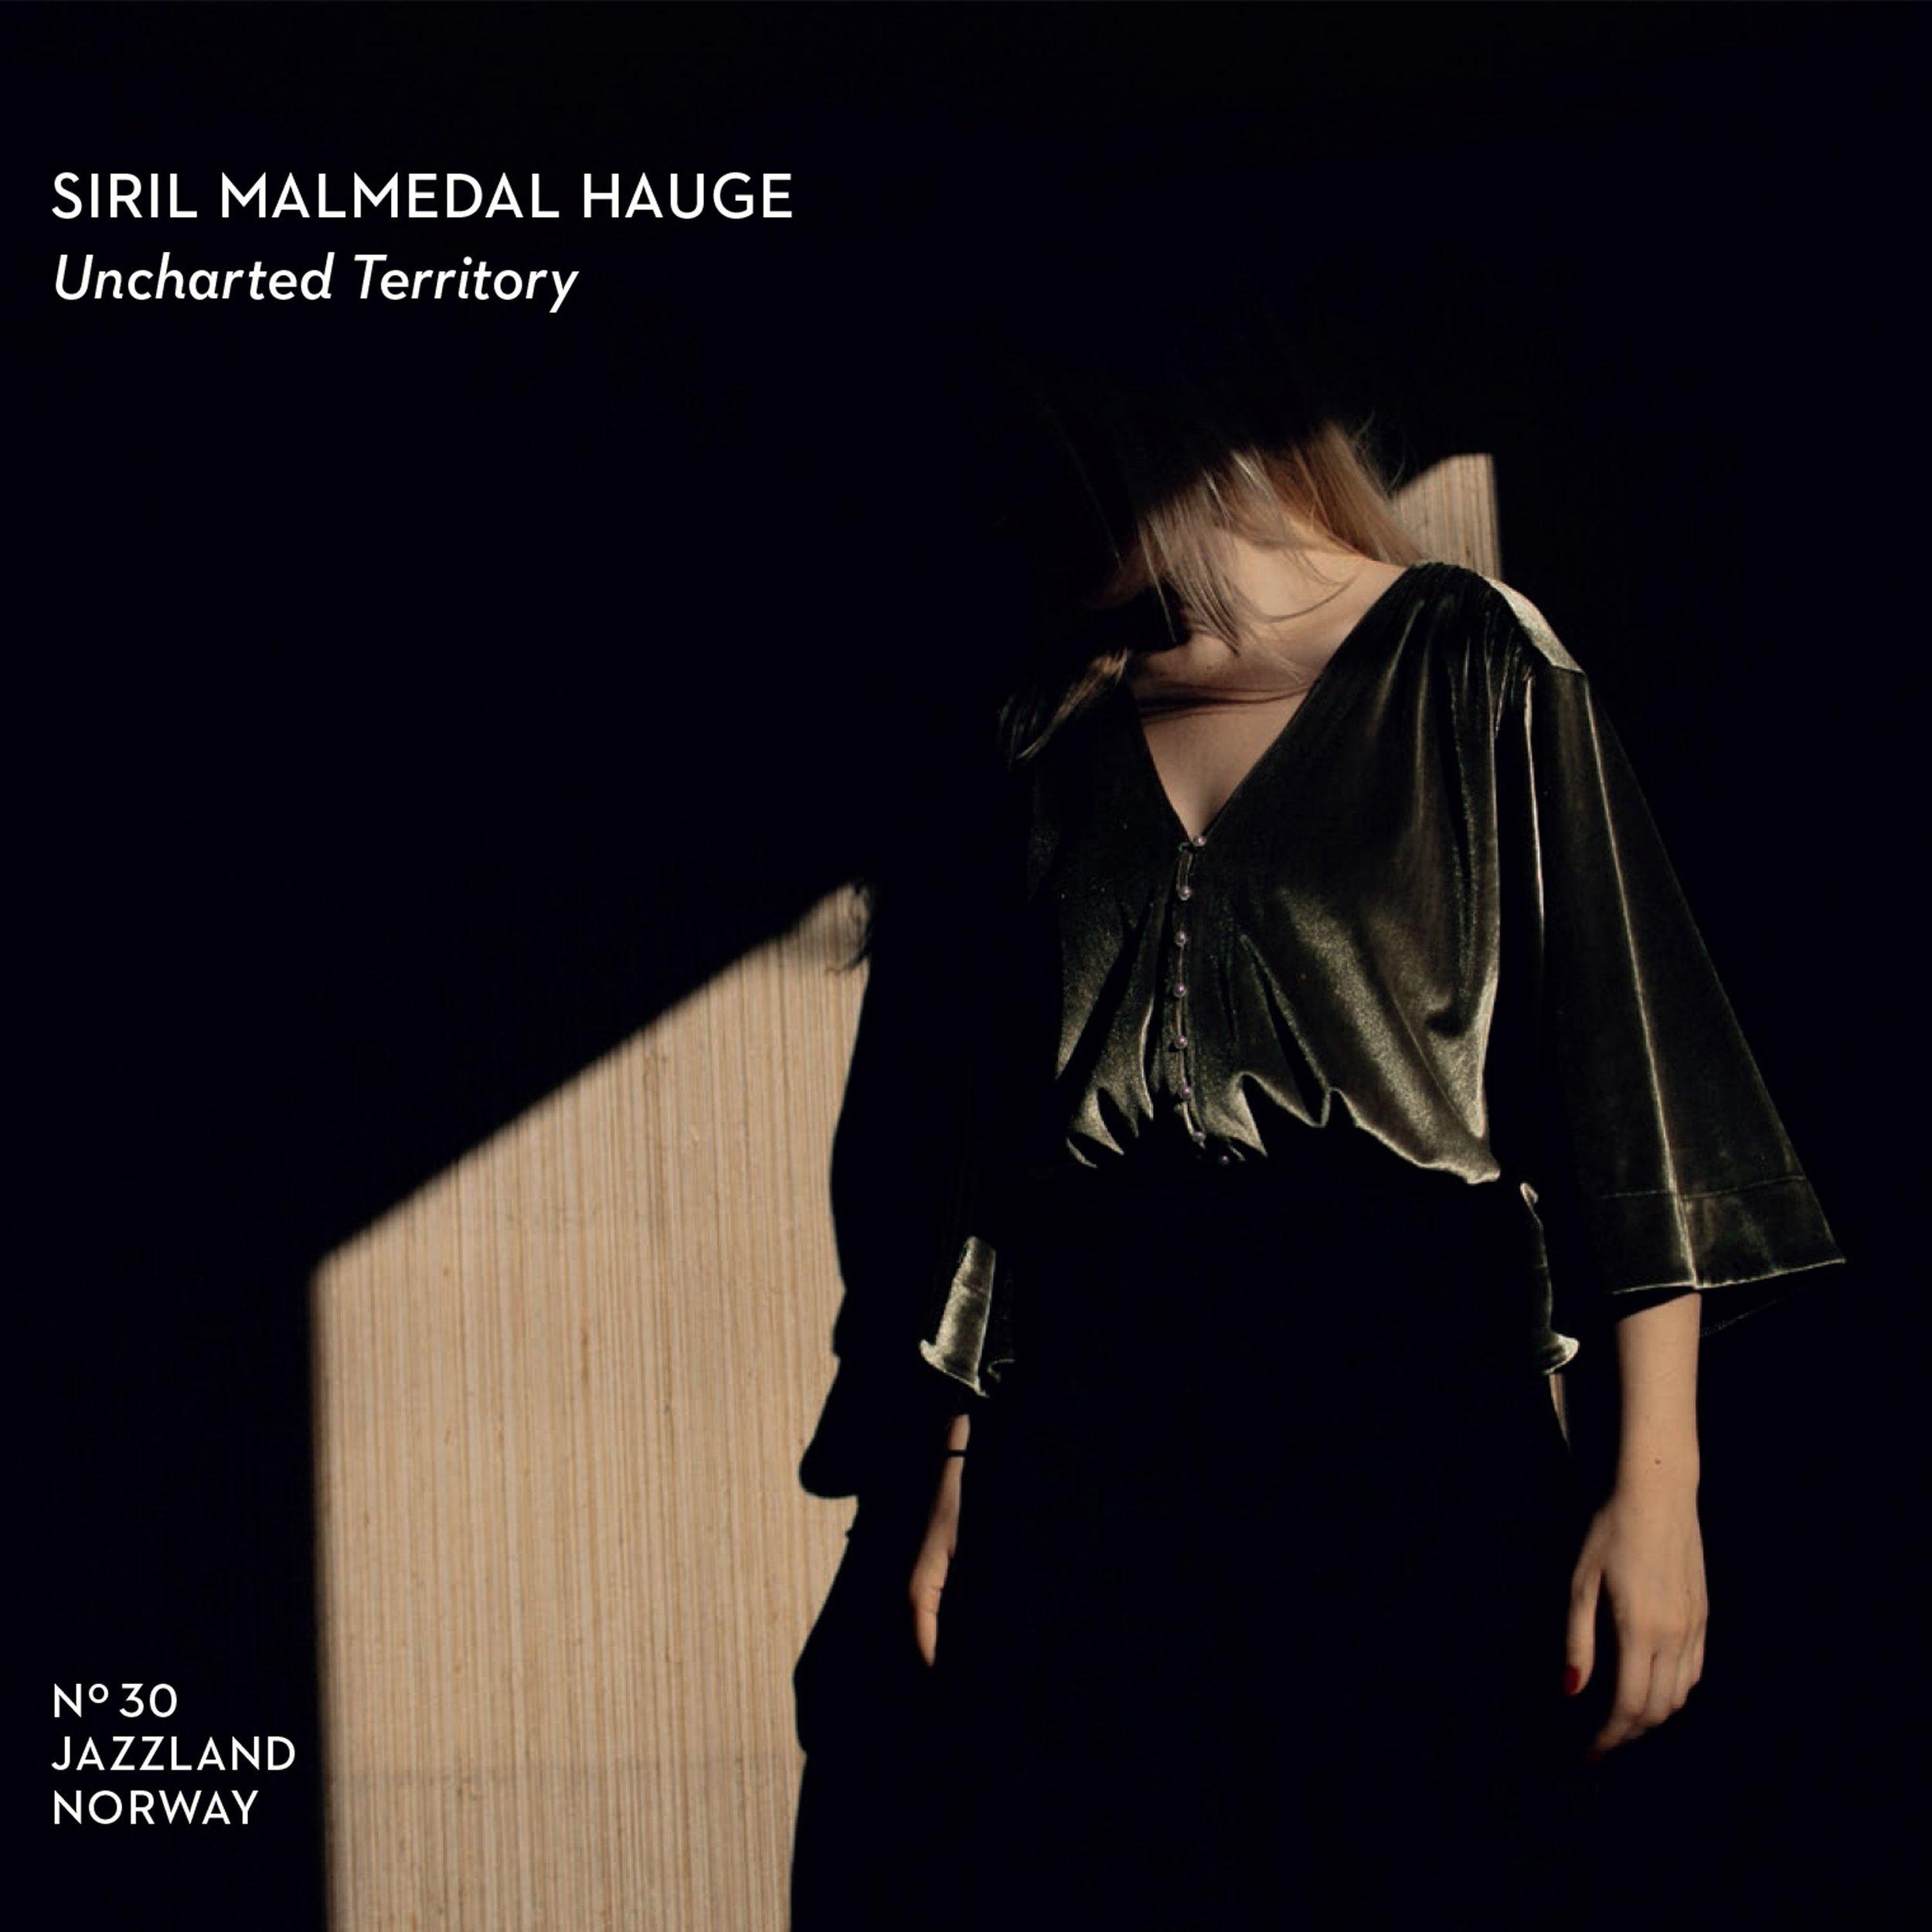 Uncharted Territory (Siril Malmedal Hauge, 2019)